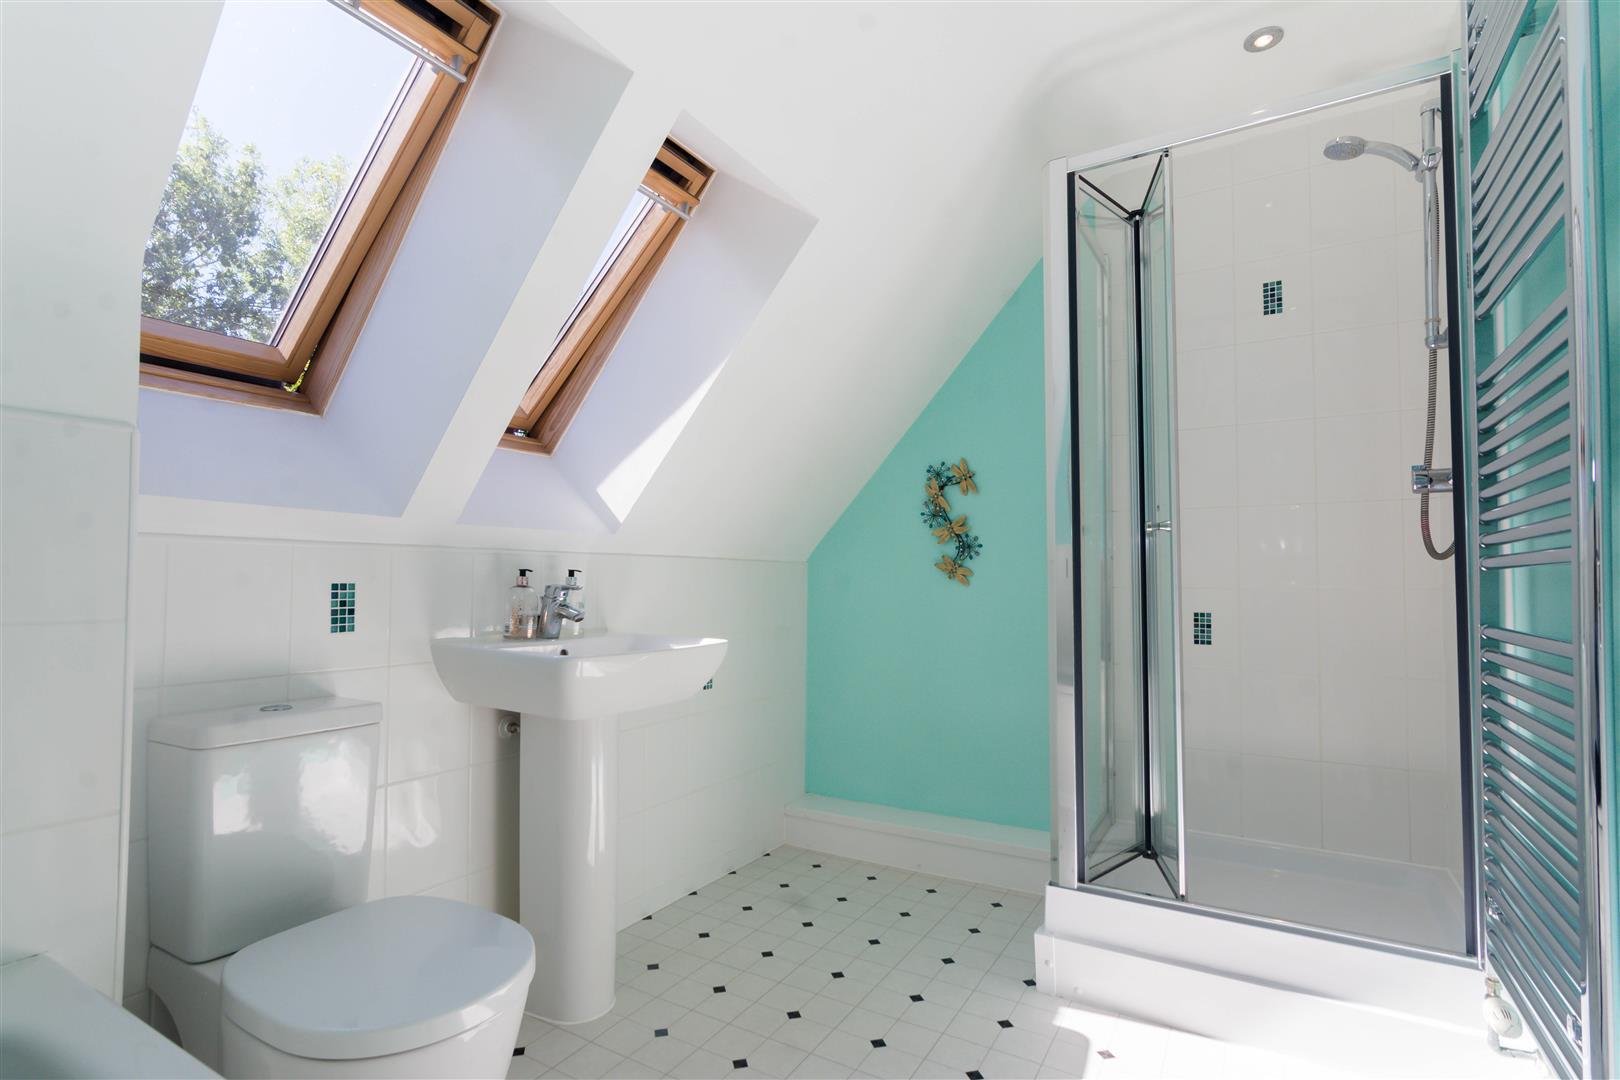 Vs Full Bathroom En Suite Bathroom: Detached : Greenlea Close, Yeadon, Leeds